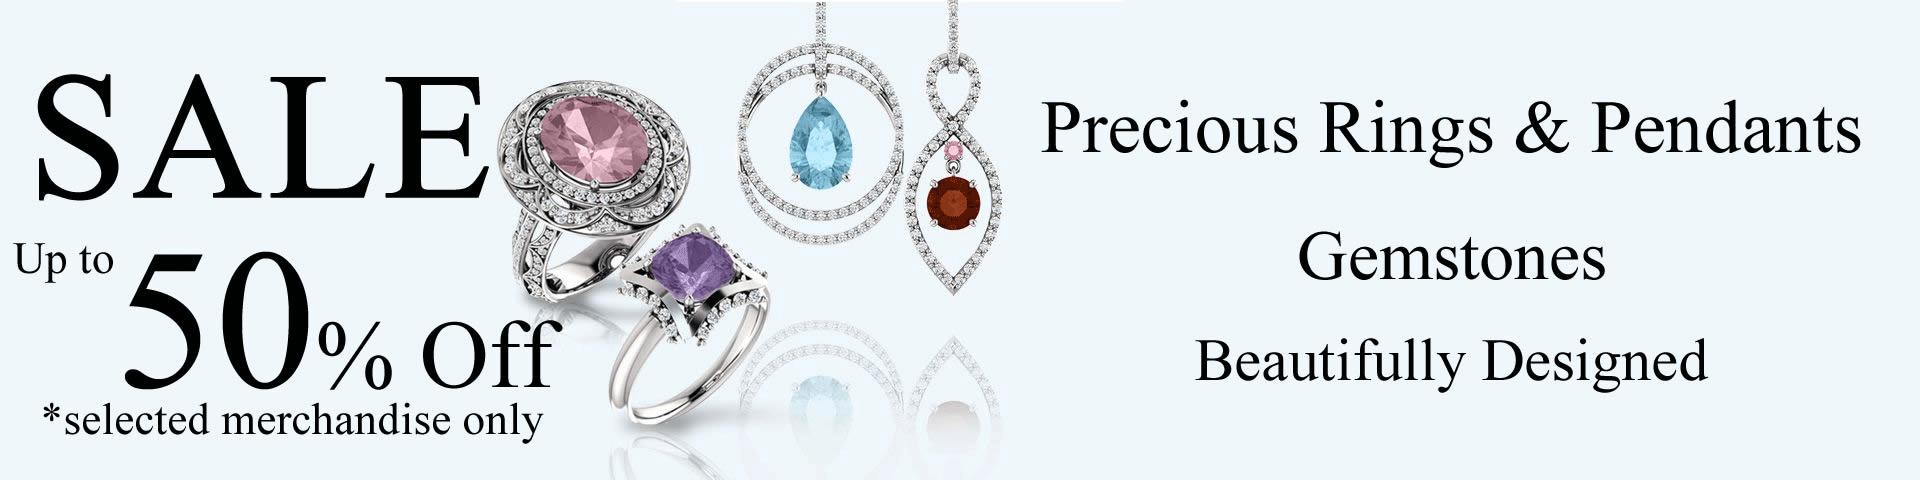 Gemstone Jewelry Sale